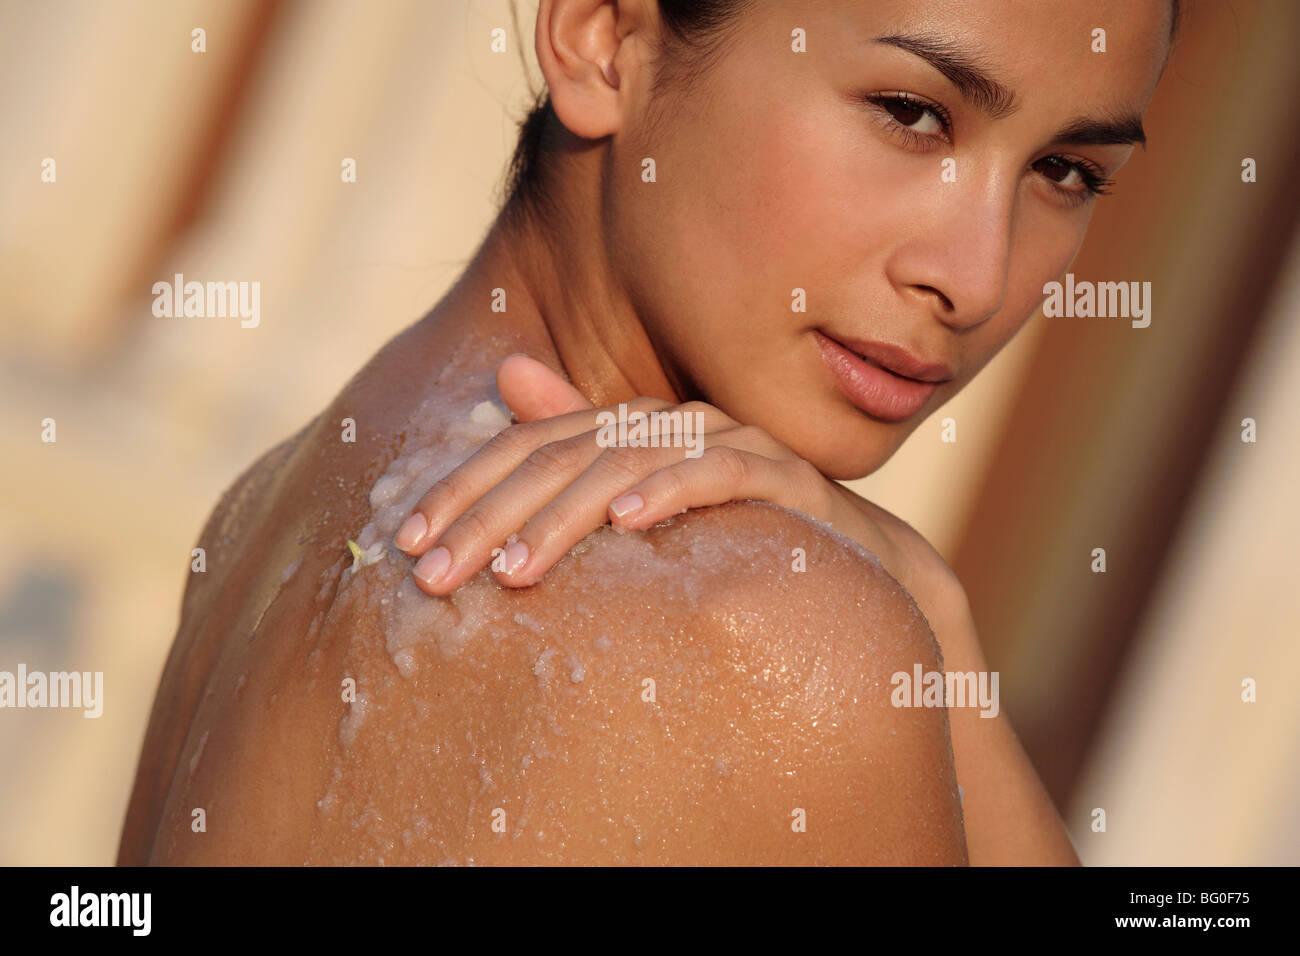 Jasmine scrub at Ananda Spa, Ananda in the Himalayas, India, Asia - Stock Image